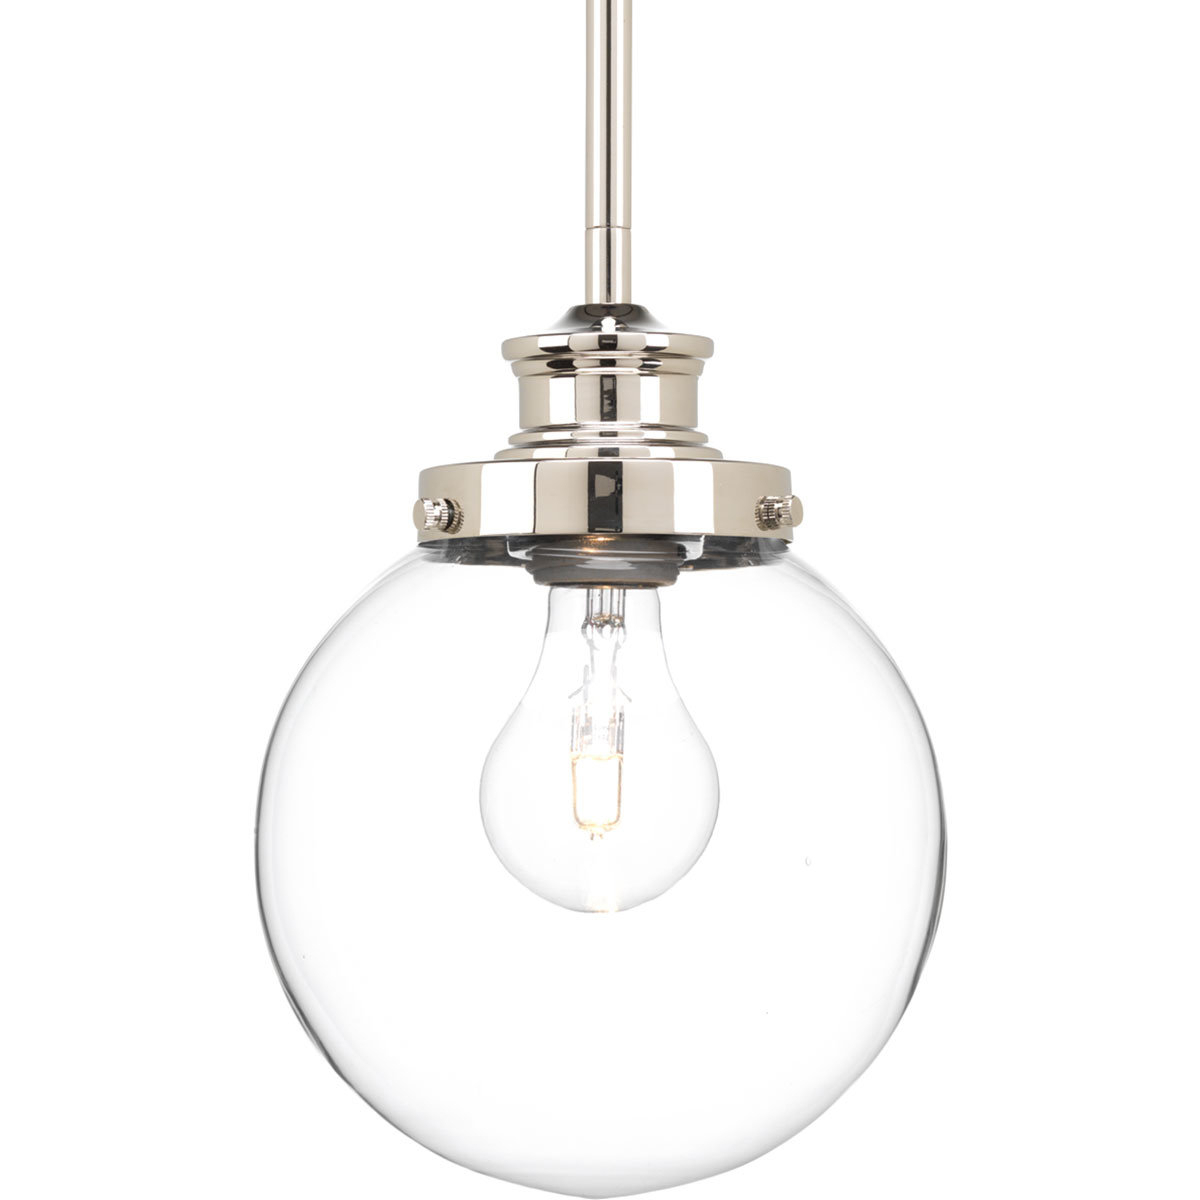 Modern Zipcode Design Pendant Lighting | Allmodern in Bainbridge 1-Light Single Cylinder Pendants (Image 22 of 30)